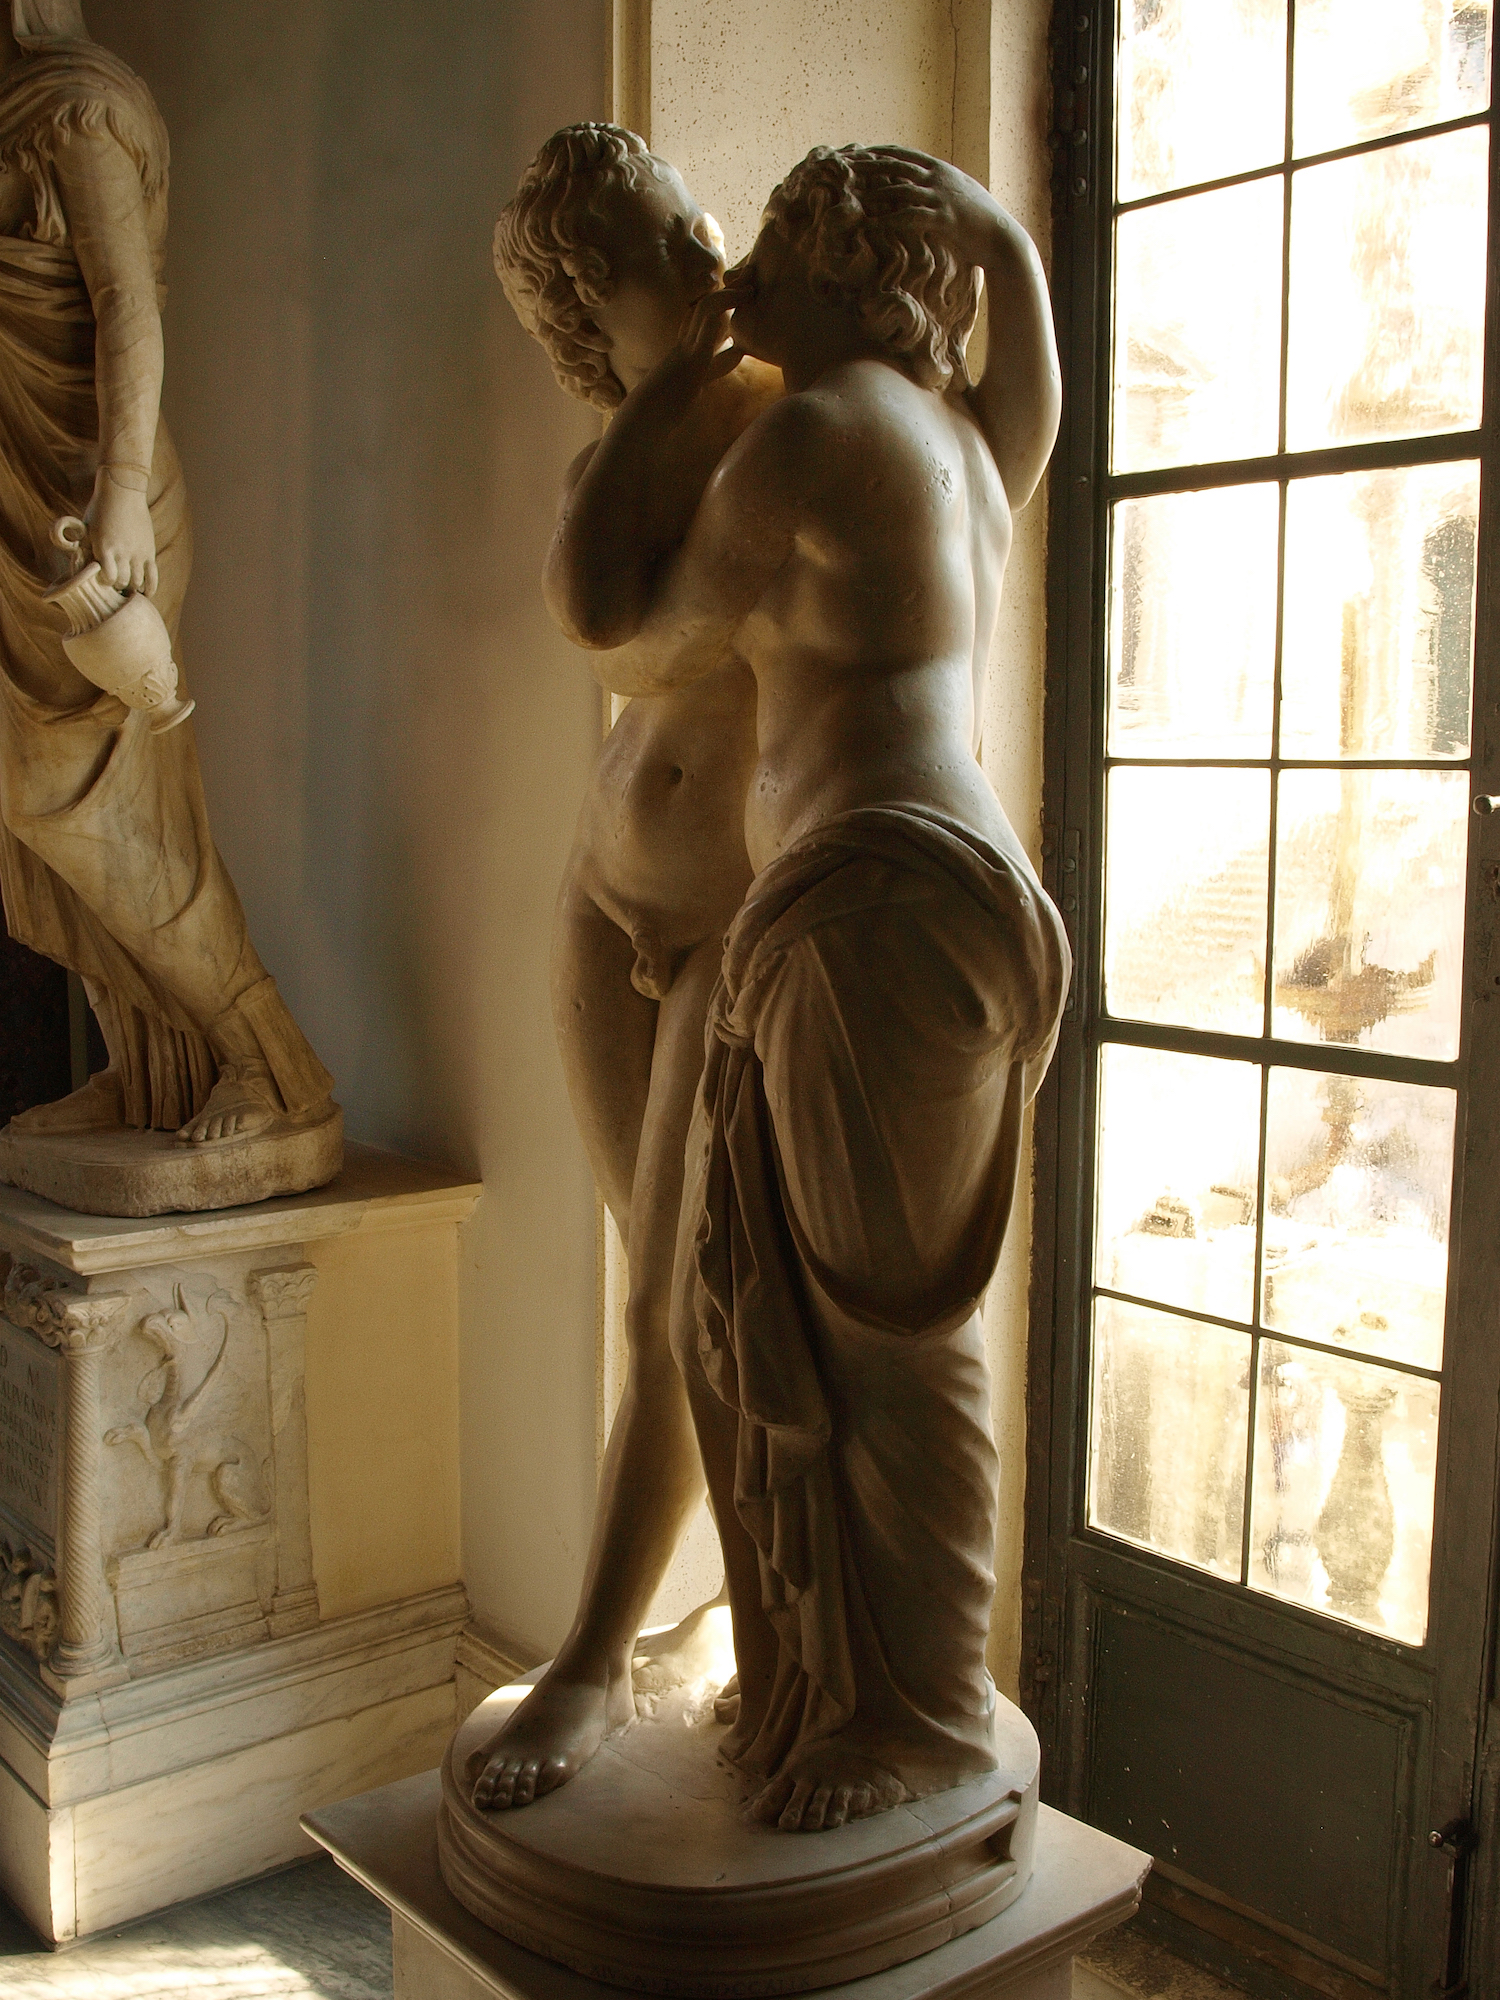 Erós and Psyché  , Musei Capitolini, Piazza del Campidoglio, Italy  / Geena Matuson @geenamatuson #thegirlmirage